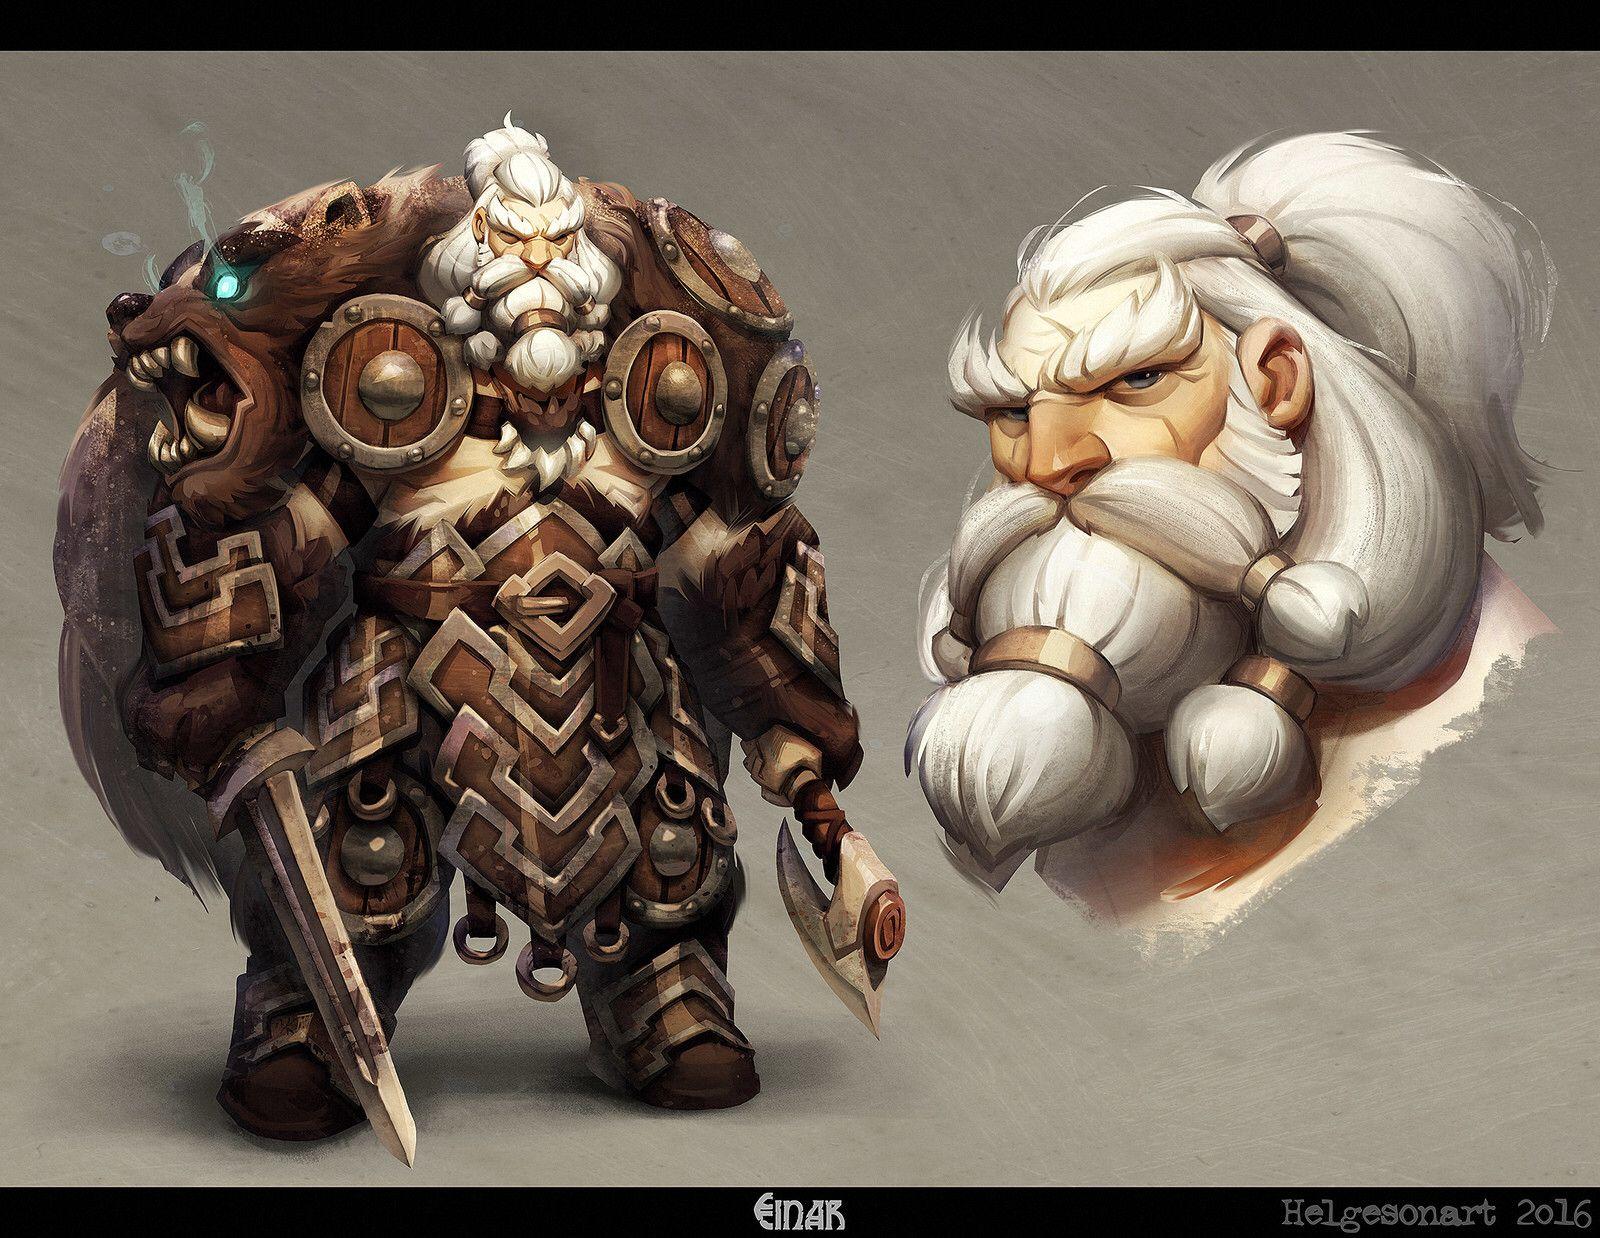 Game Character Design Apps : Share via artstation ios app artstation © 2016 fantasy character